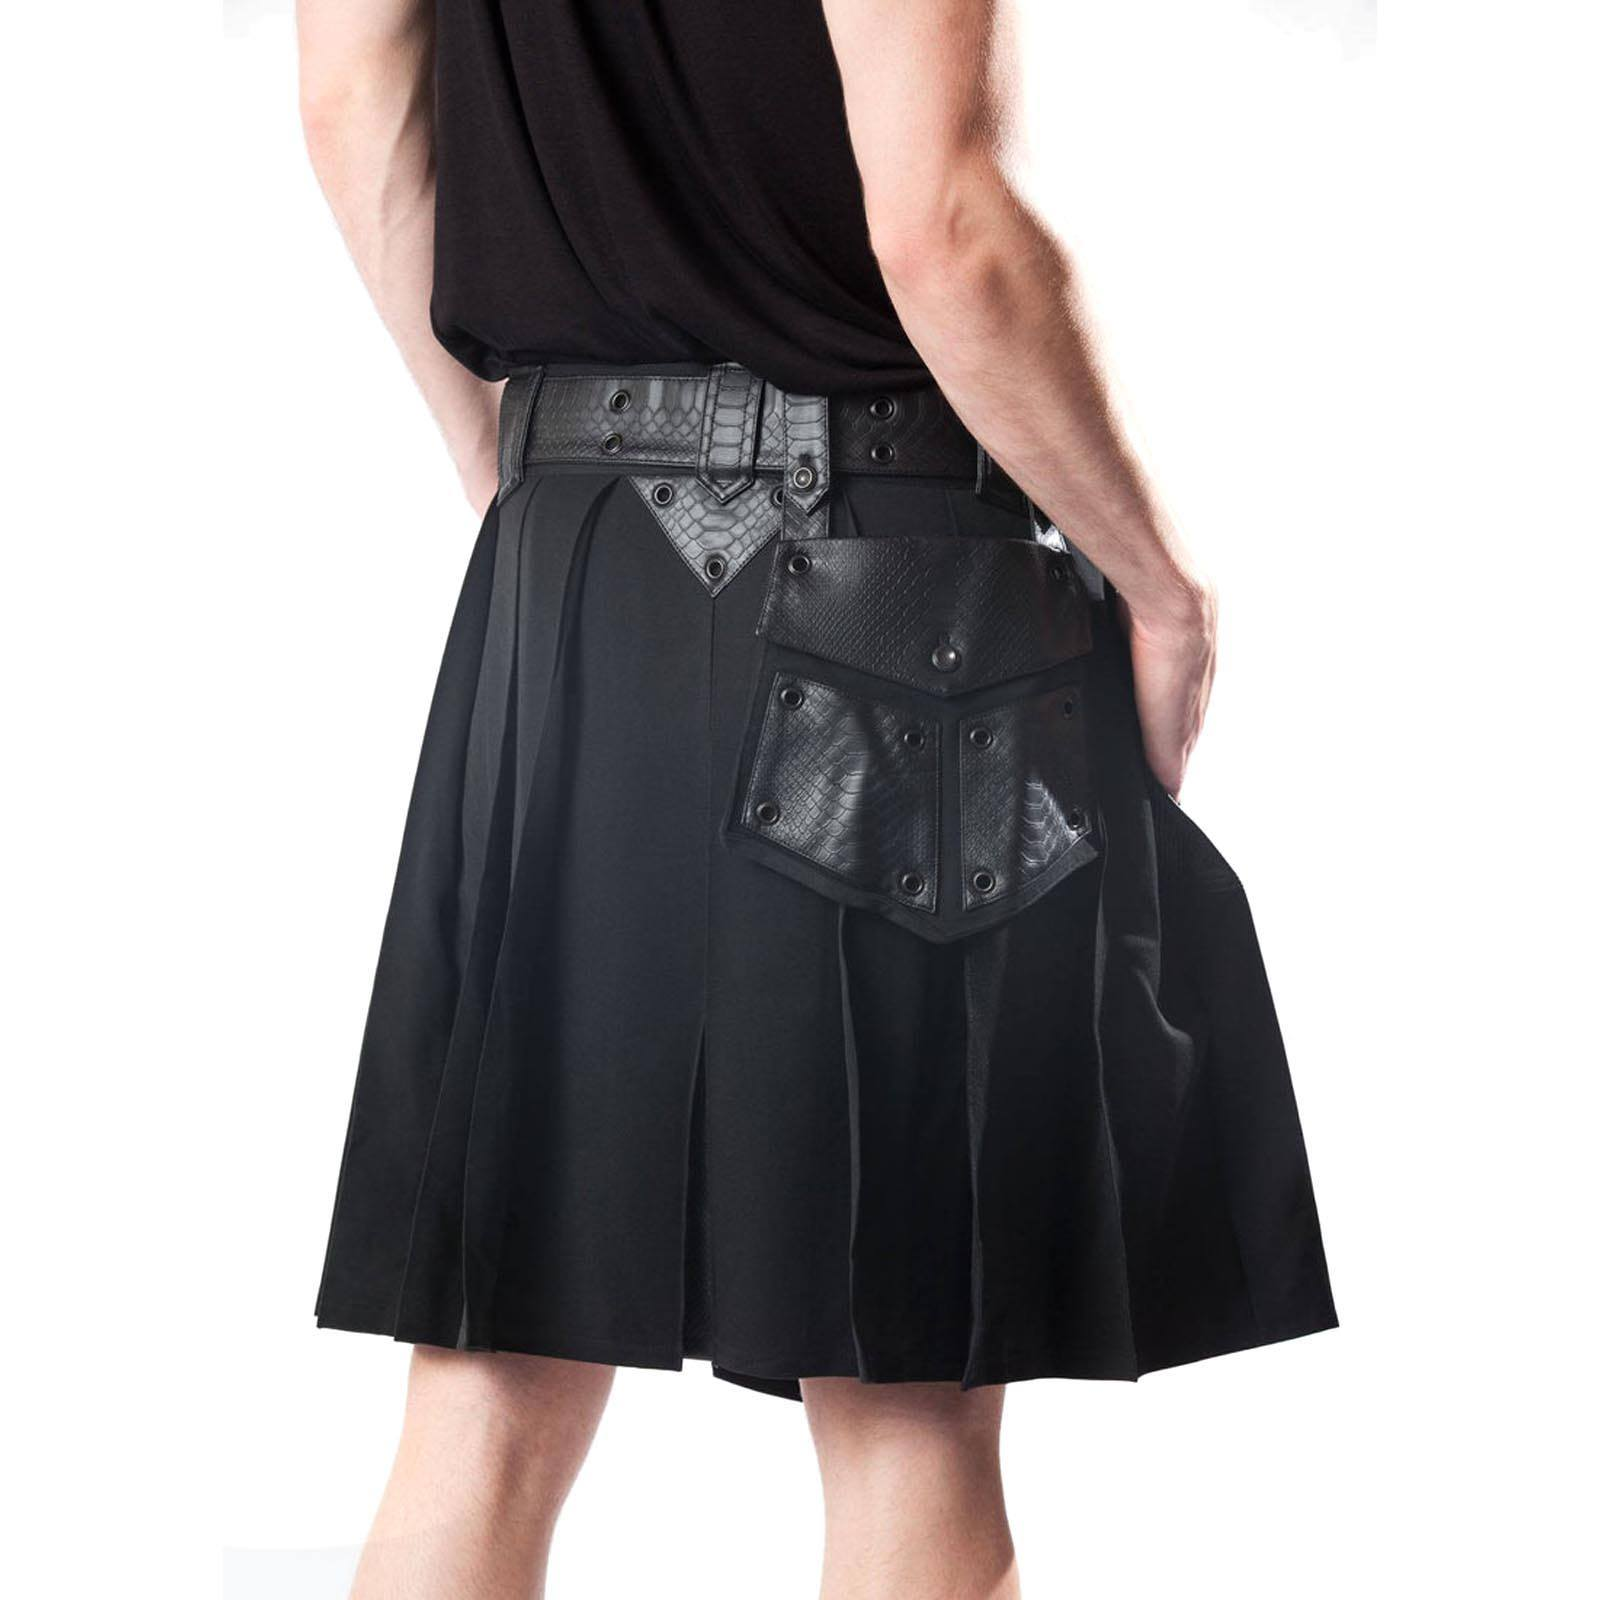 Leather Gothic Kilt